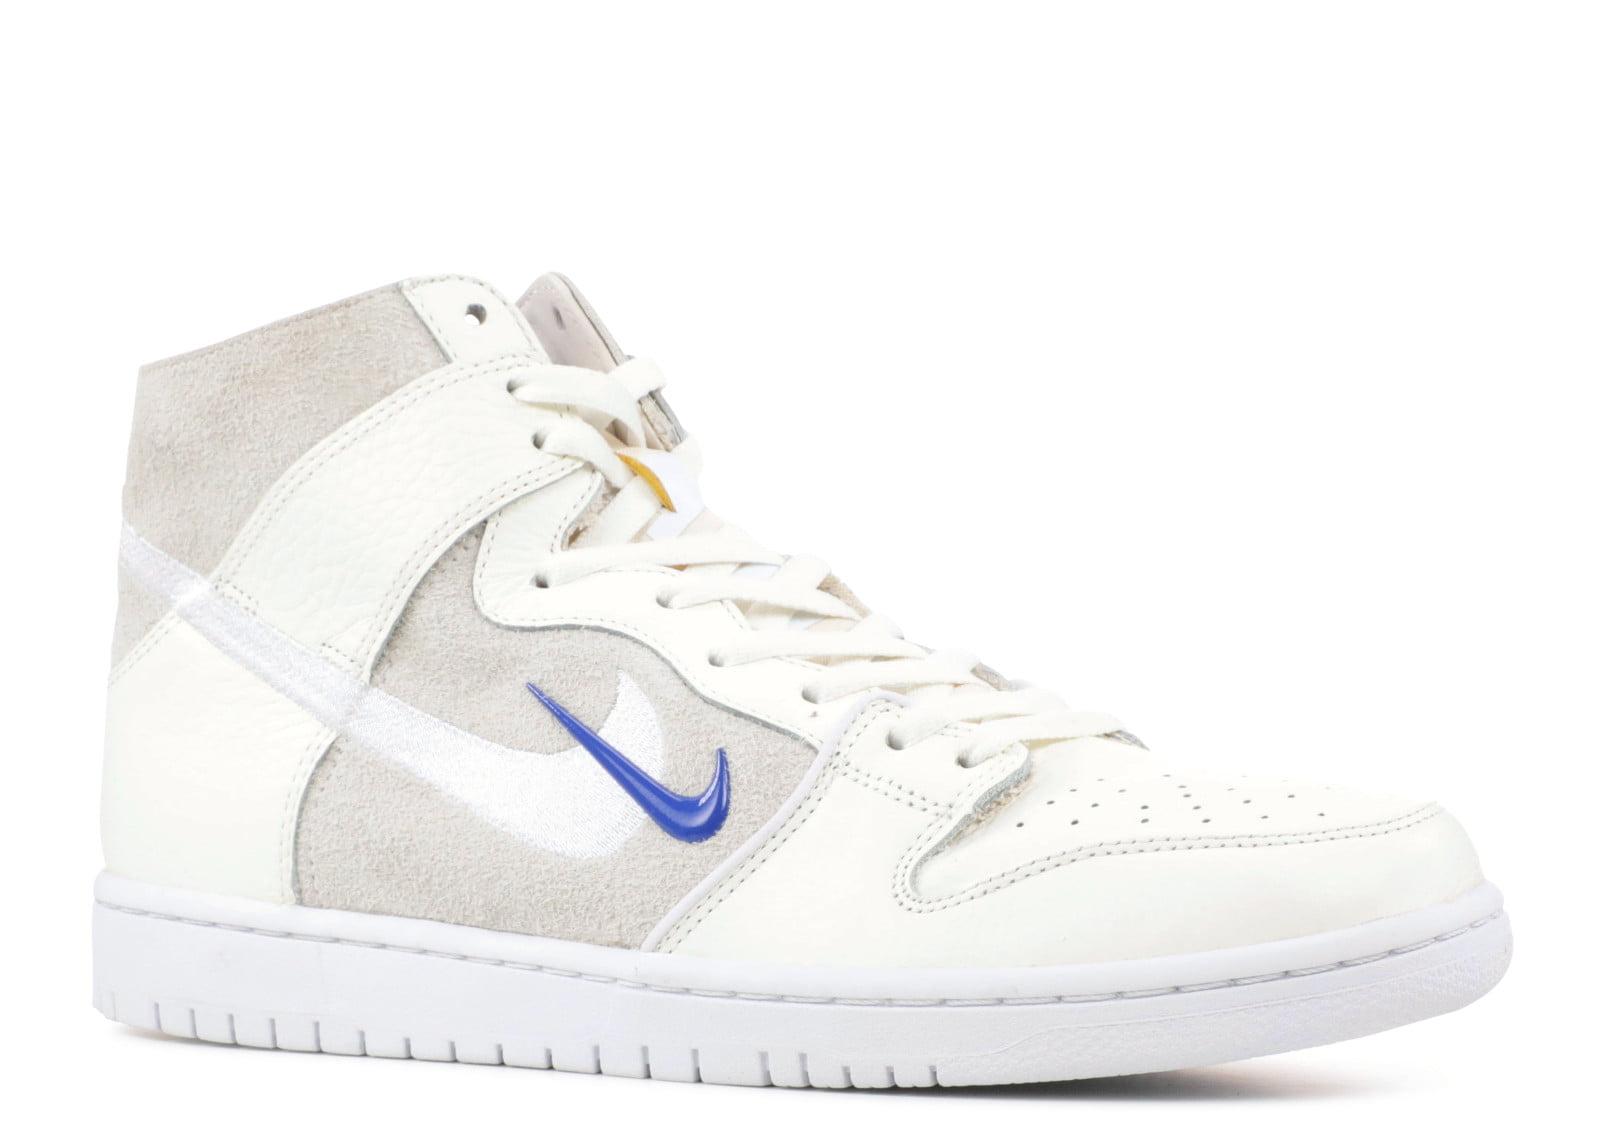 4799e3793dd2f Nike - Men - Nike Sb Zoom Dunk Hi Pro Qs  Soulland  - Ah9613-141 ...